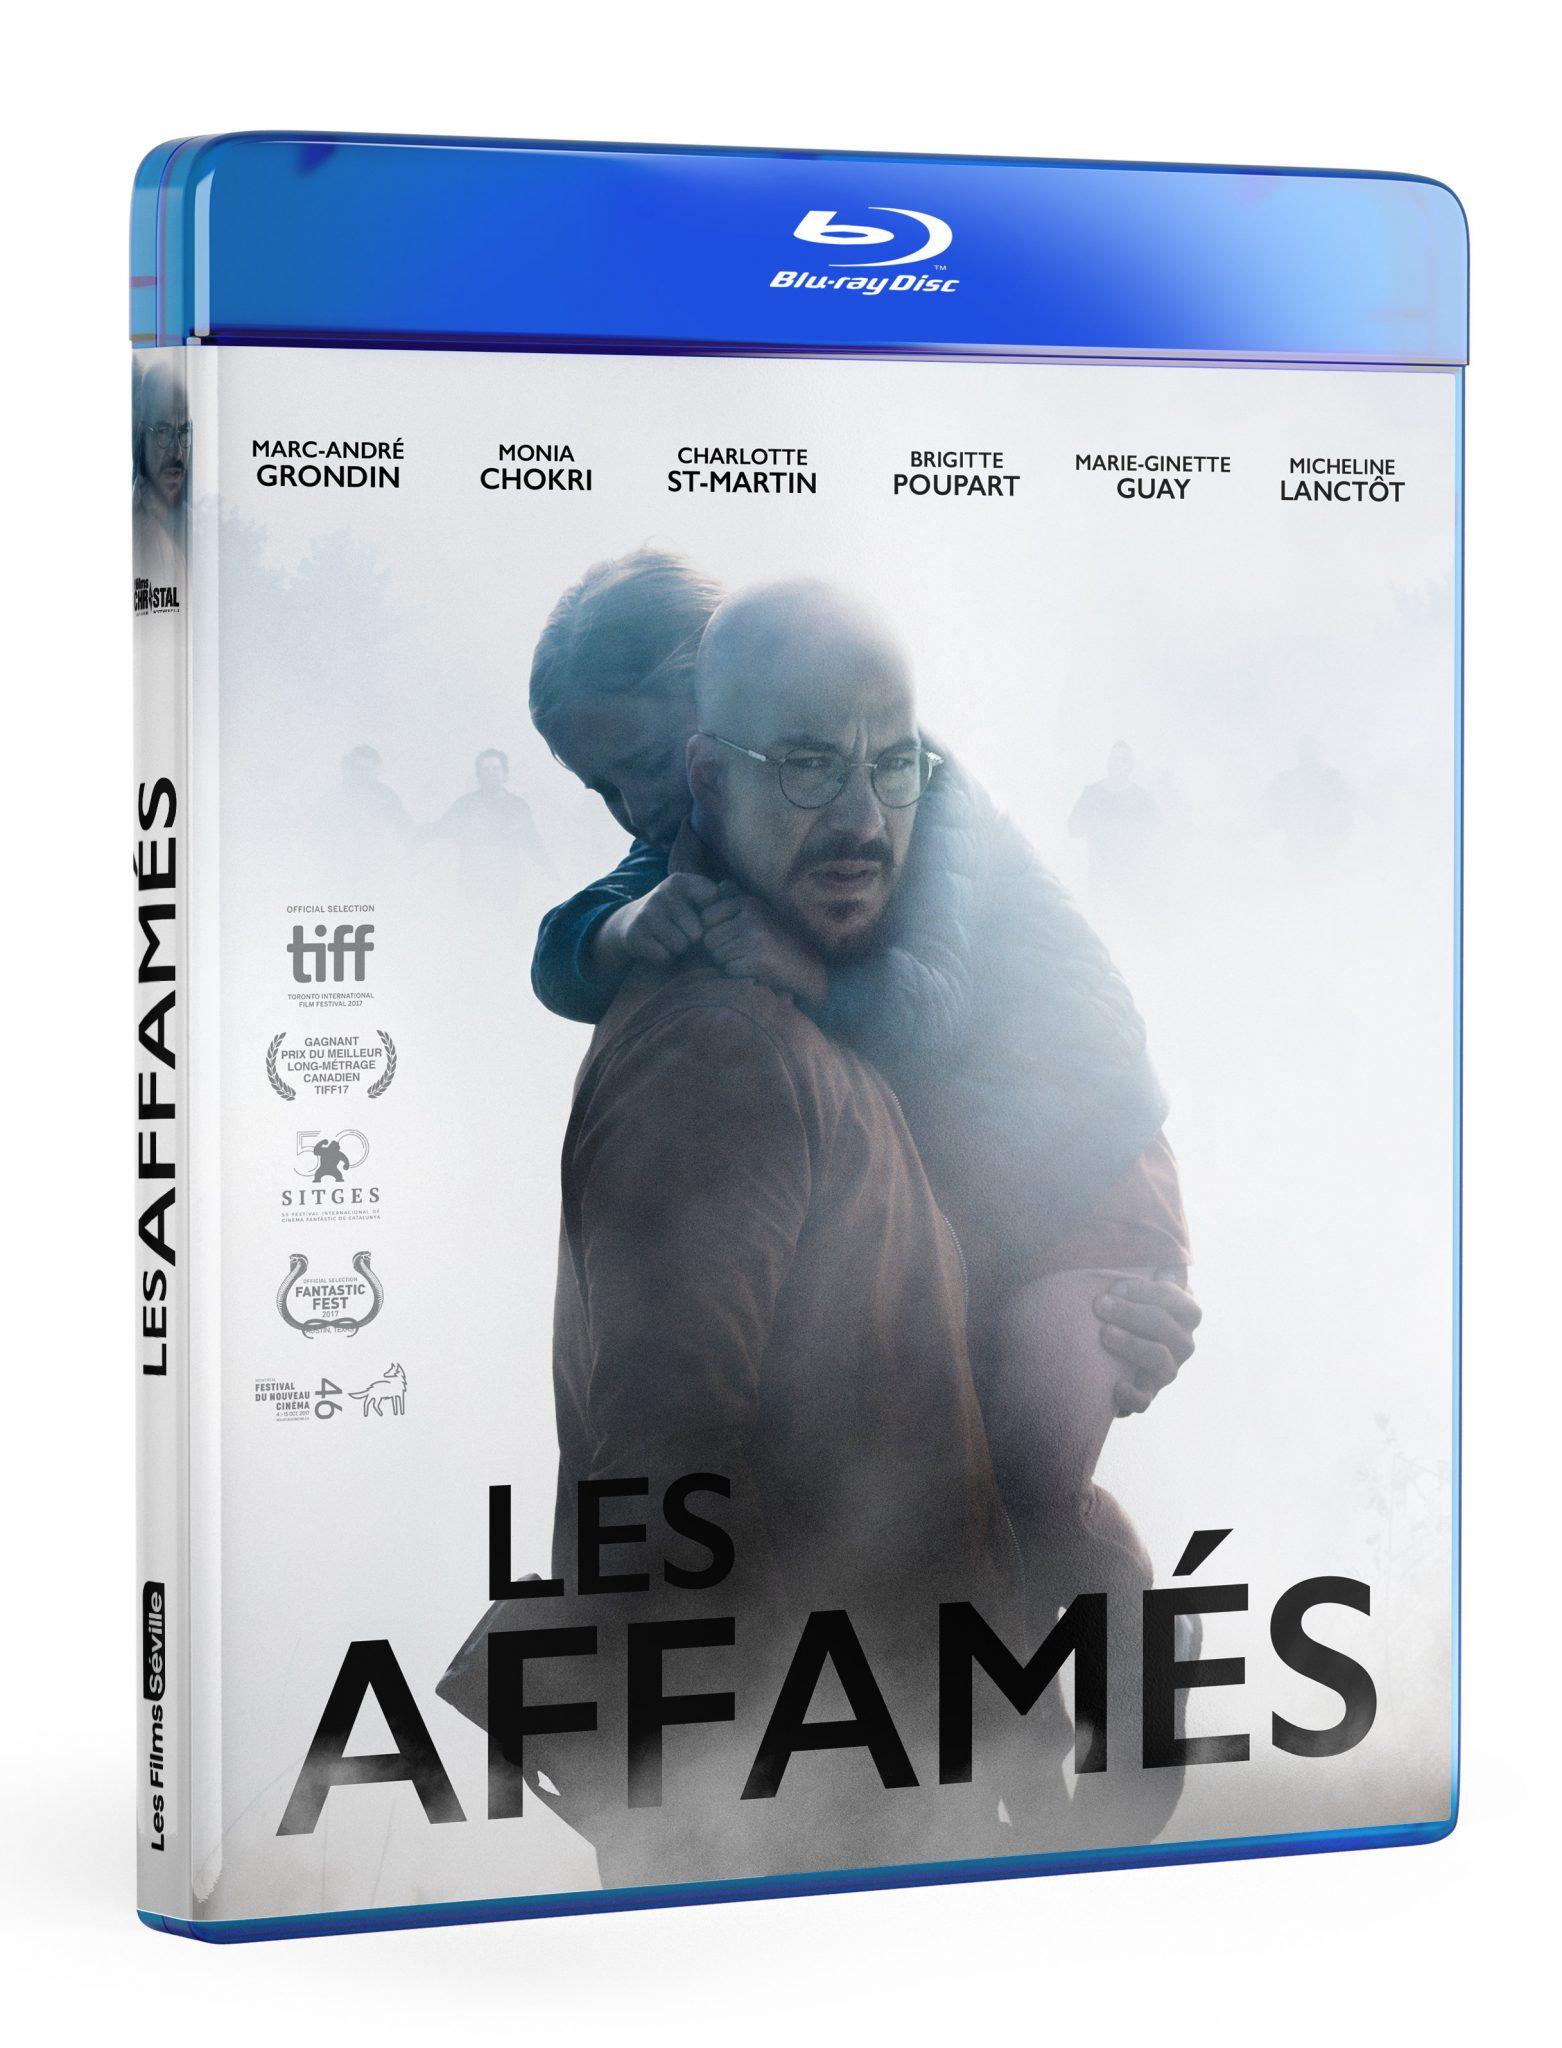 Les Affamés - Gagnant de 8 prix Iris, le Blu-Ray sera lancé le 31 juillet 2018